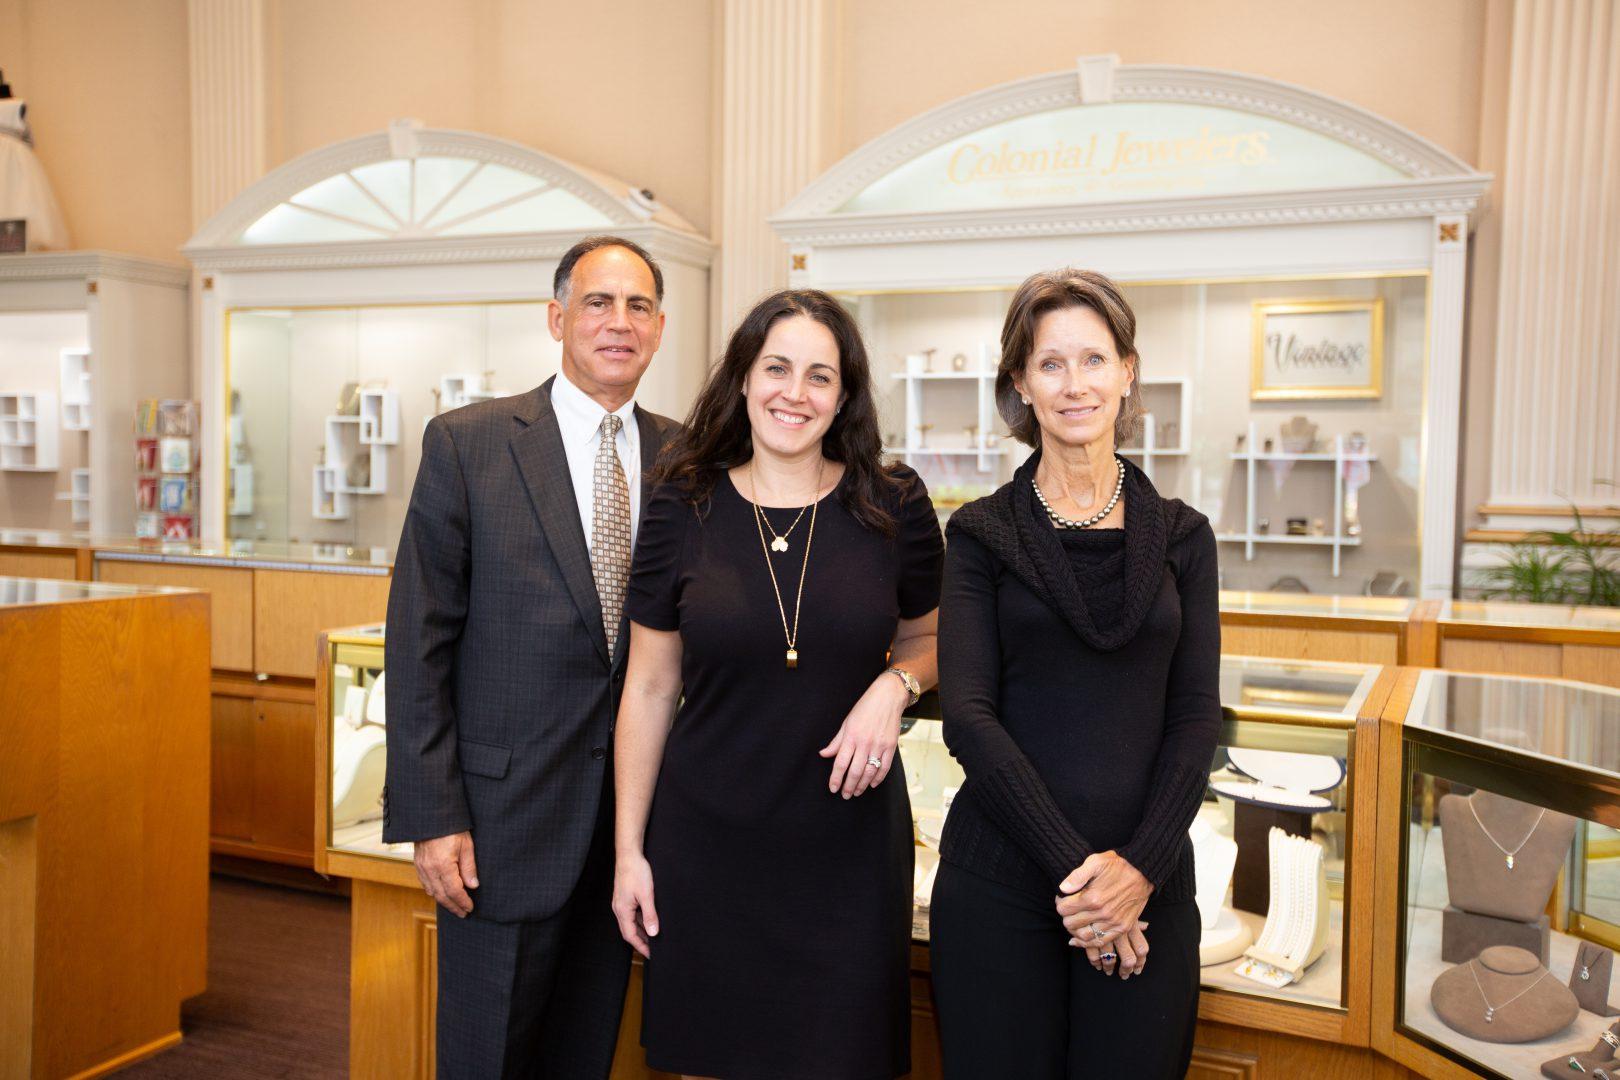 The Hurwitz Family